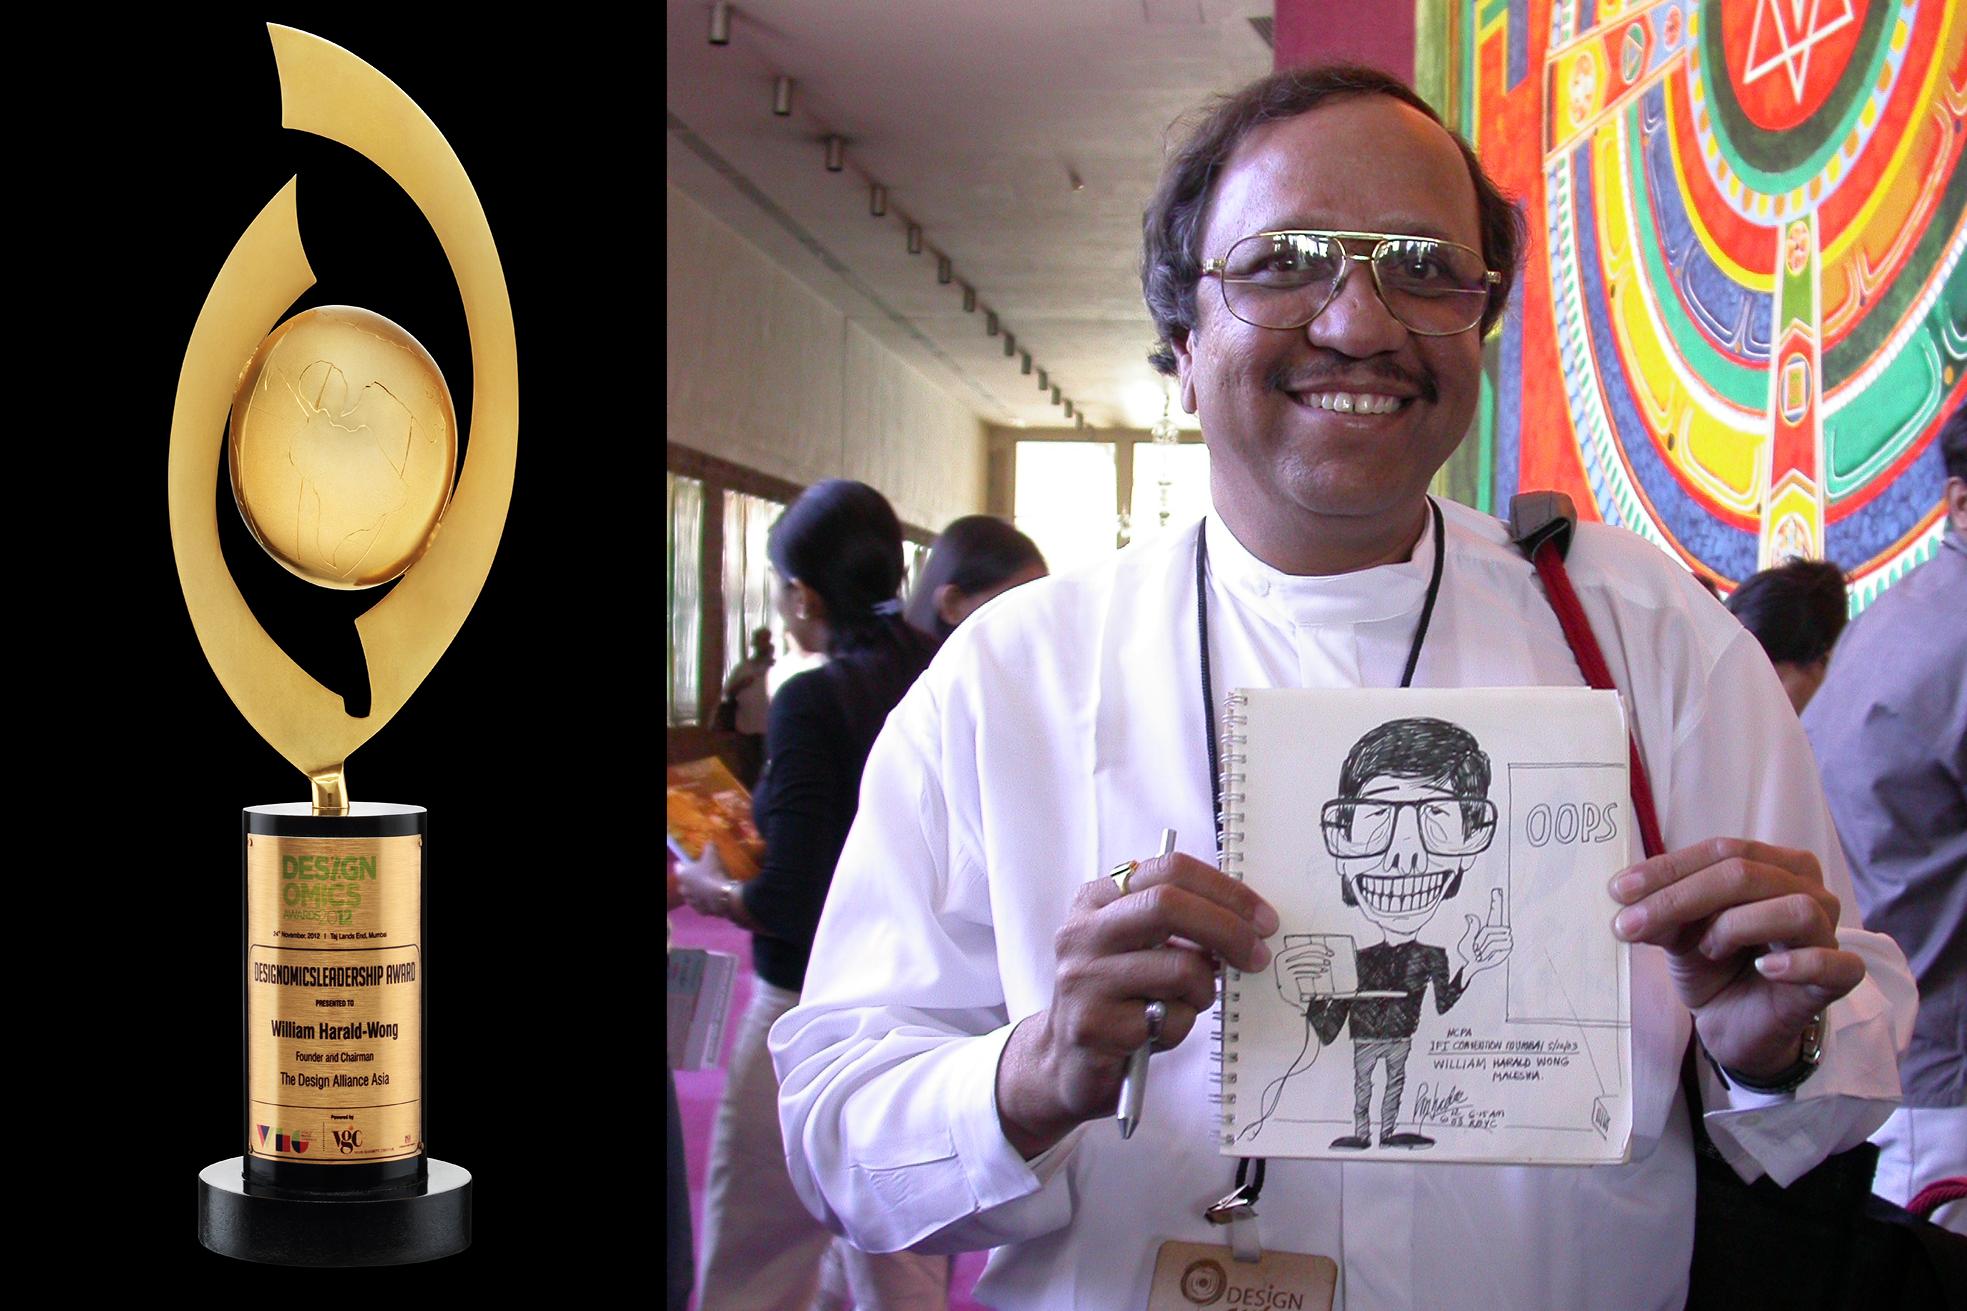 whwWeb_DFAA_Designomics Award.png